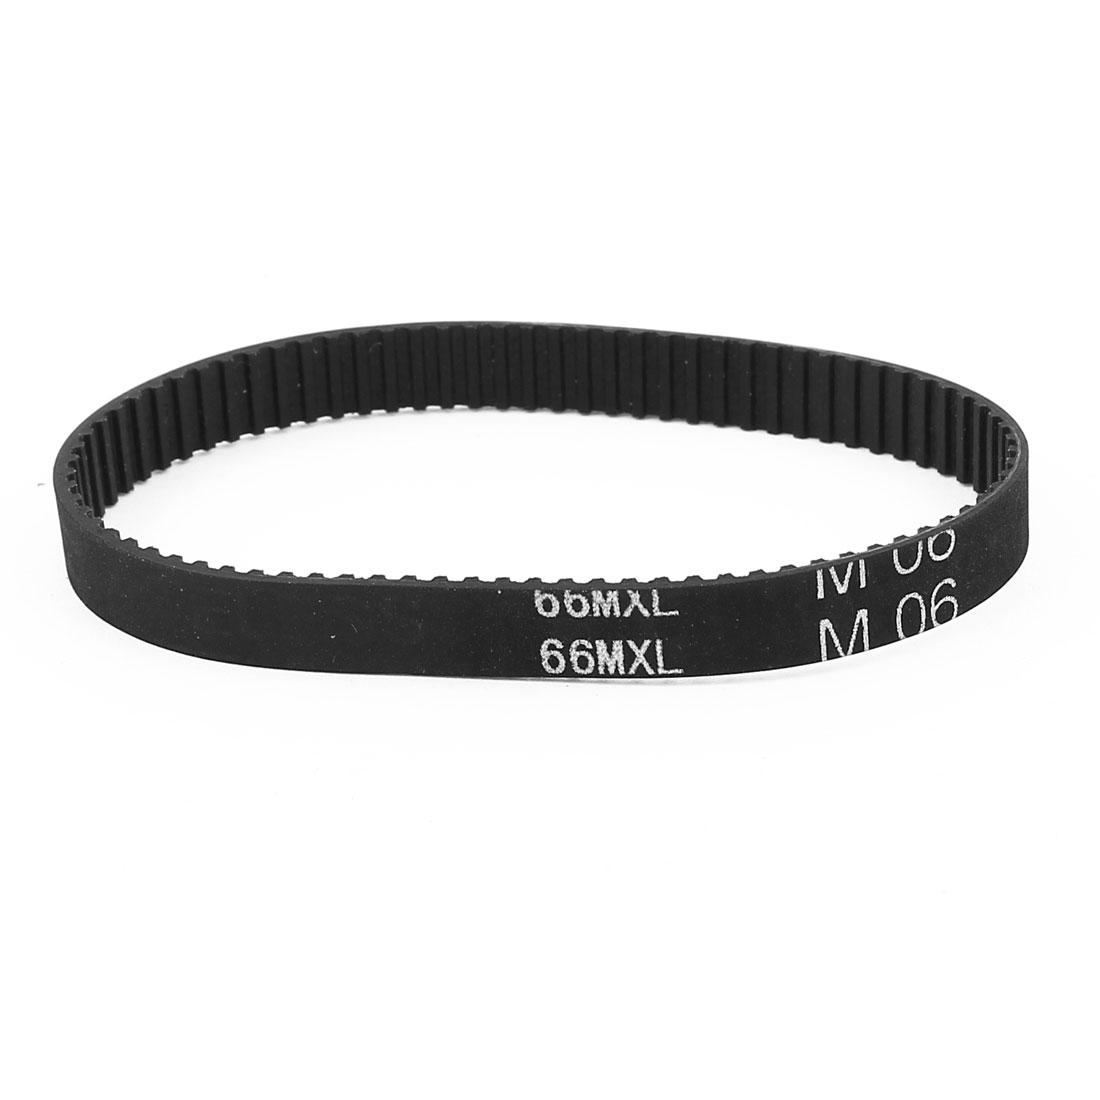 66MXL 025 83 Teeth 2.032mm Pitch 6.4mm Width Industrial Timing Belt